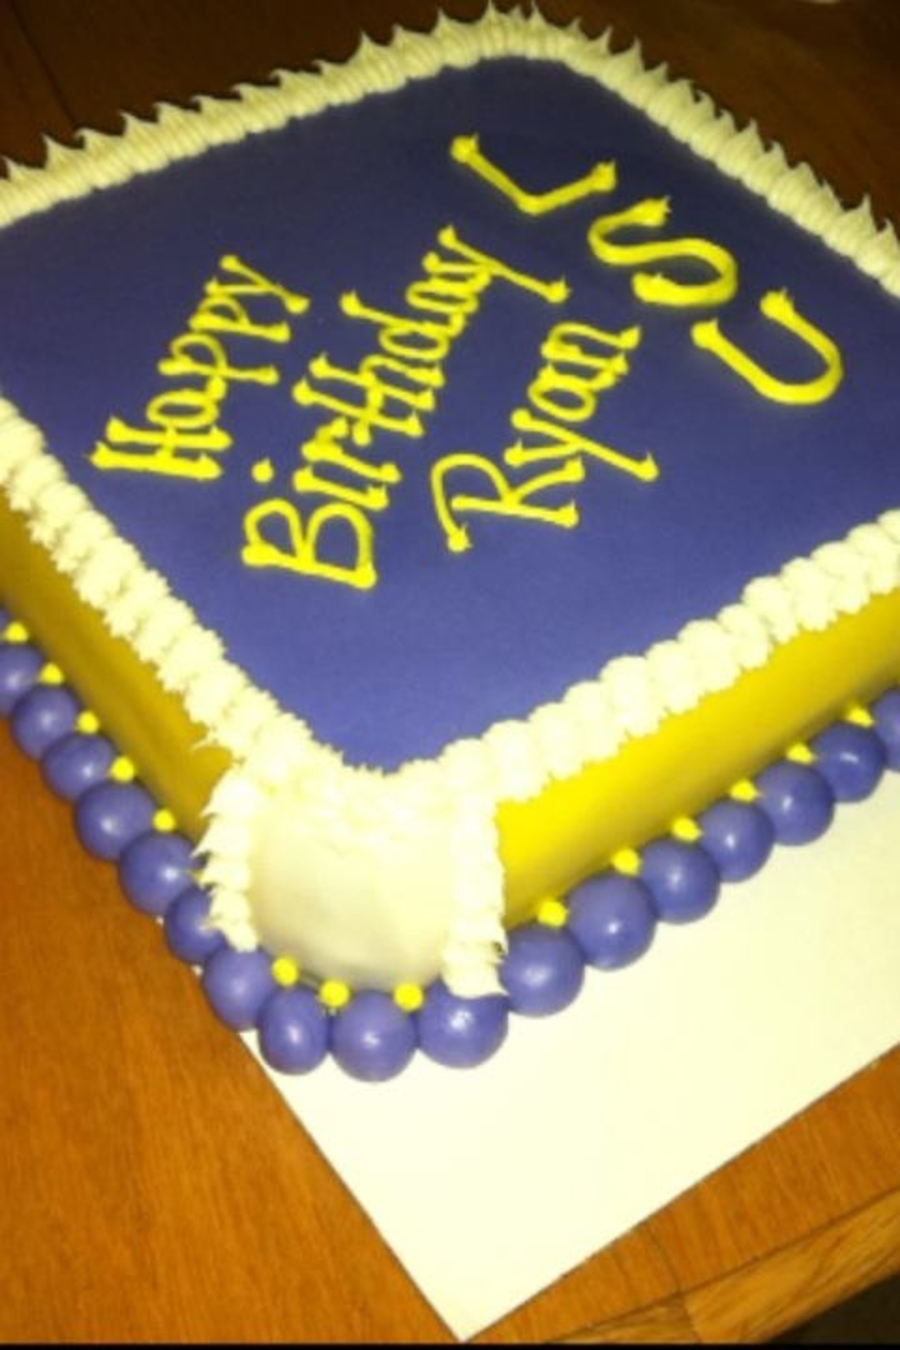 Tremendous Lsu Birthday Cake Cakecentral Com Personalised Birthday Cards Veneteletsinfo